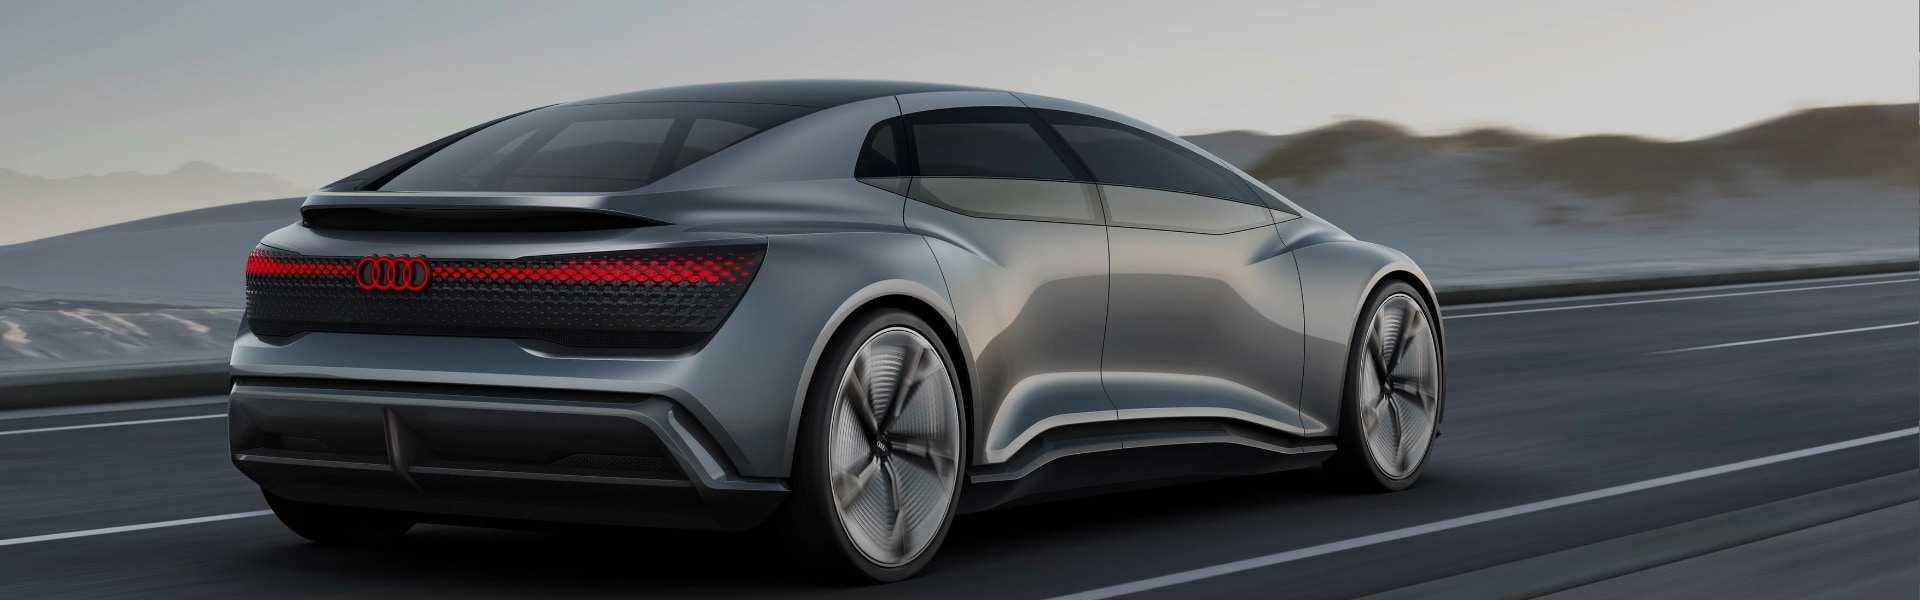 60 Best Review Audi W8 2019 Concept Engine by Audi W8 2019 Concept